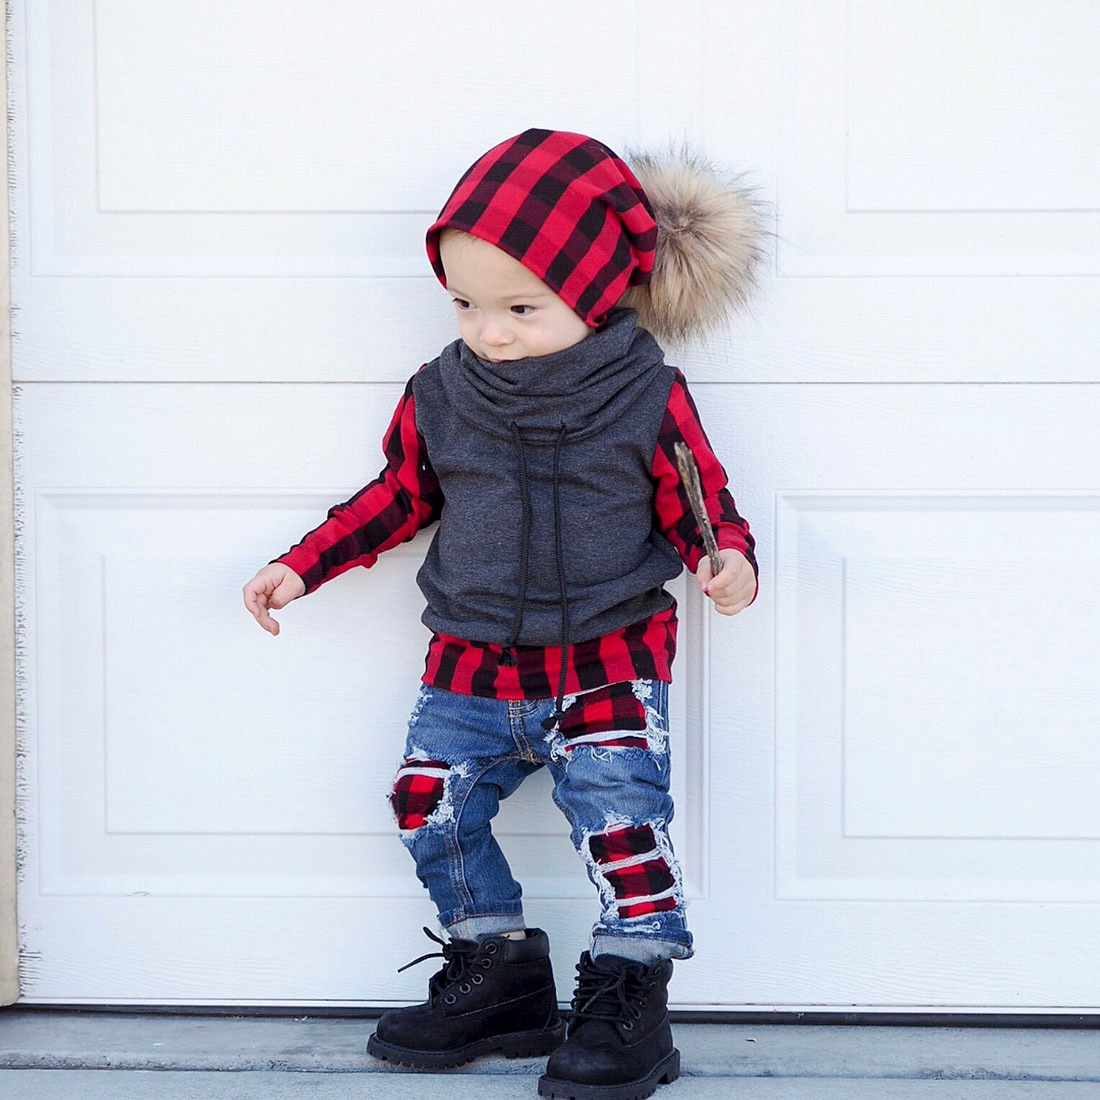 2019 Winter Warm 2pcs Toddler Kids Baby Boy Plaid Tops Pullover T Shirt Denim Hole Hip Pop Jeans Pants Leggings Outfit Clothes